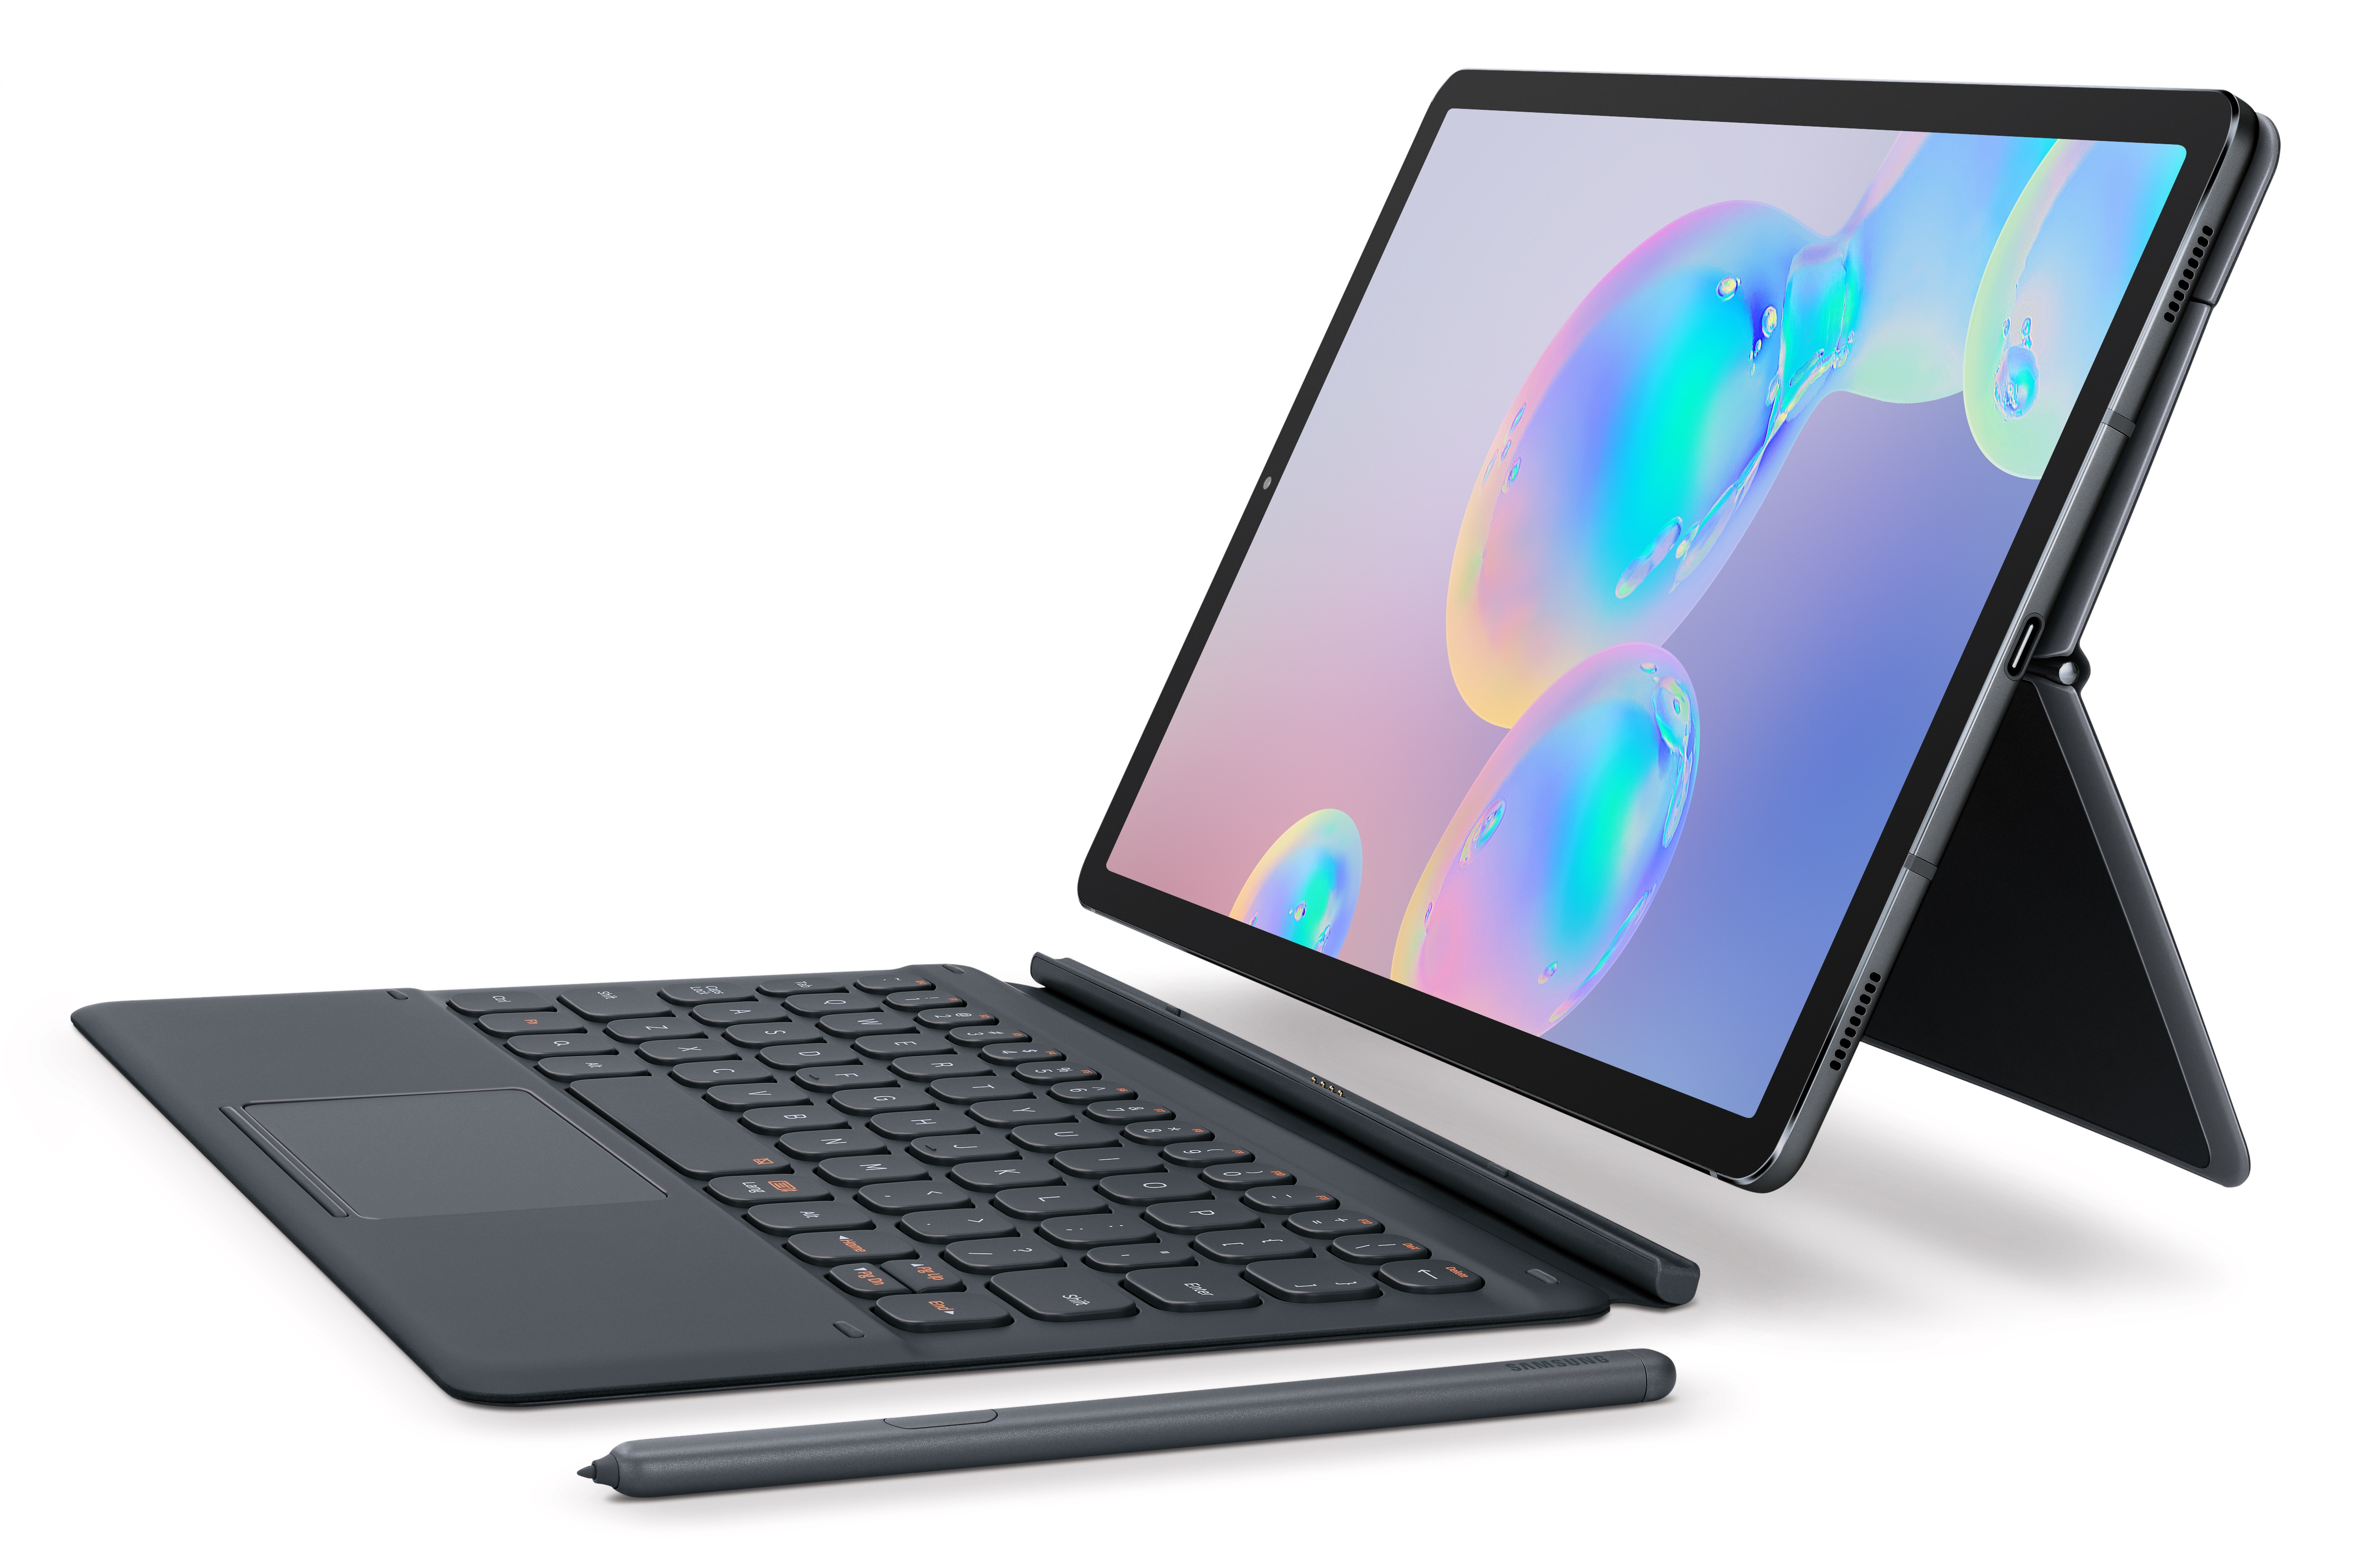 Samsung targets iPad Pro with the Galaxy Tab S6 | TechCrunch